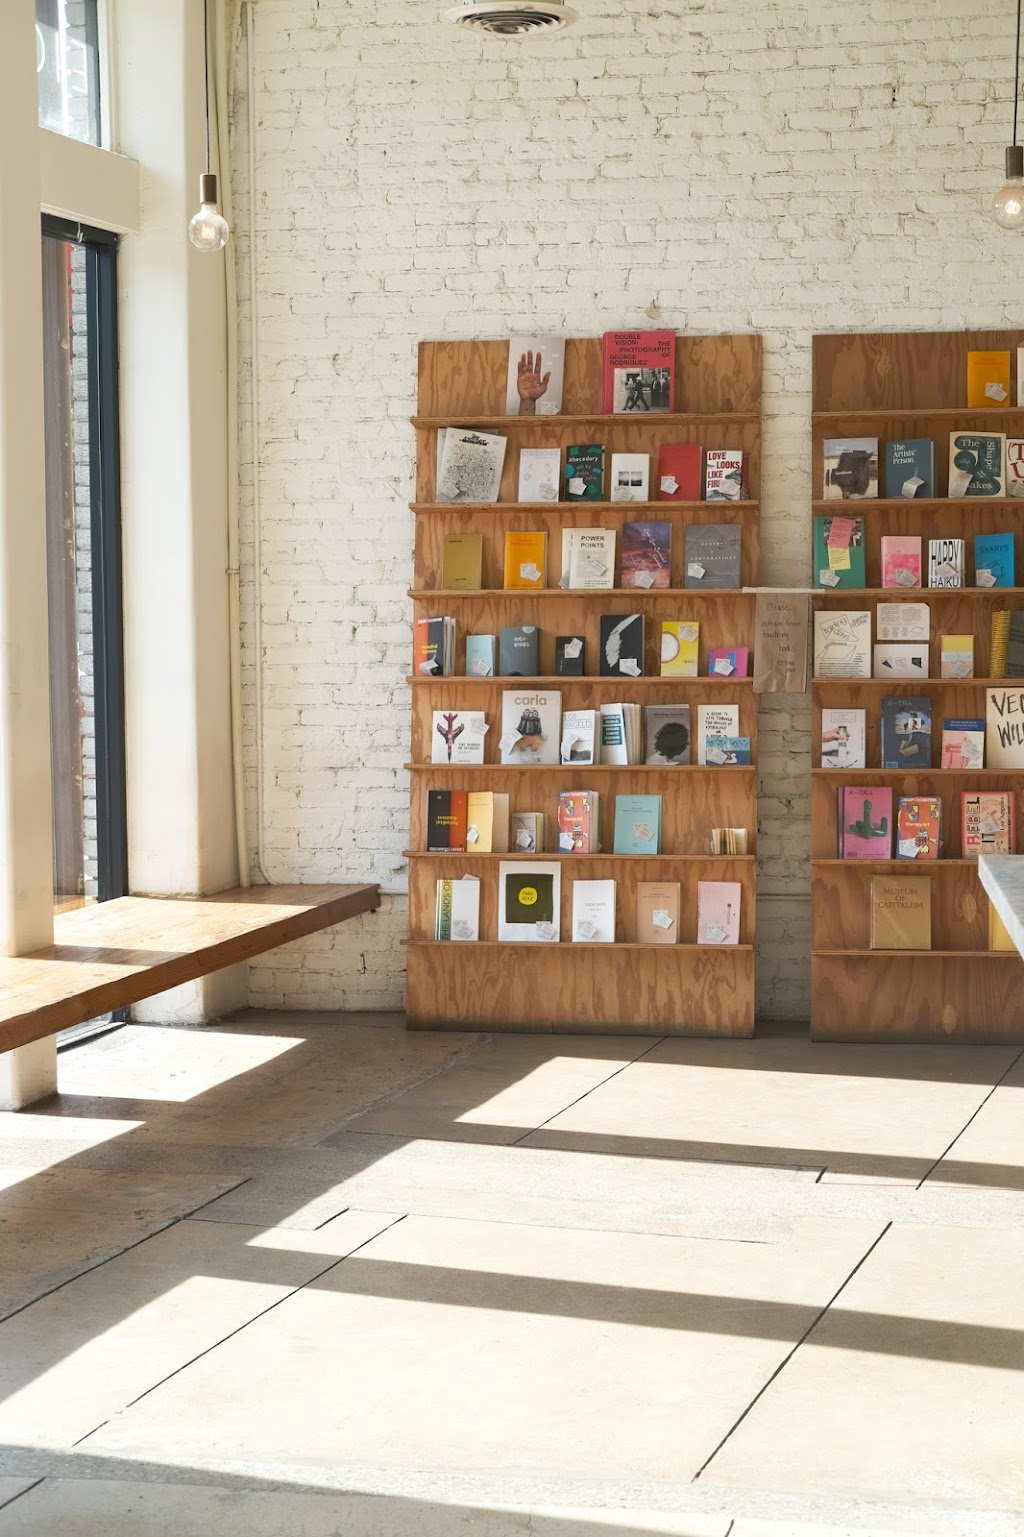 Eightfold Coffee - cafe  | Photo 3 of 10 | Address: 1294 Sunset Blvd, Los Angeles, CA 90026, USA | Phone: (213) 947-3500